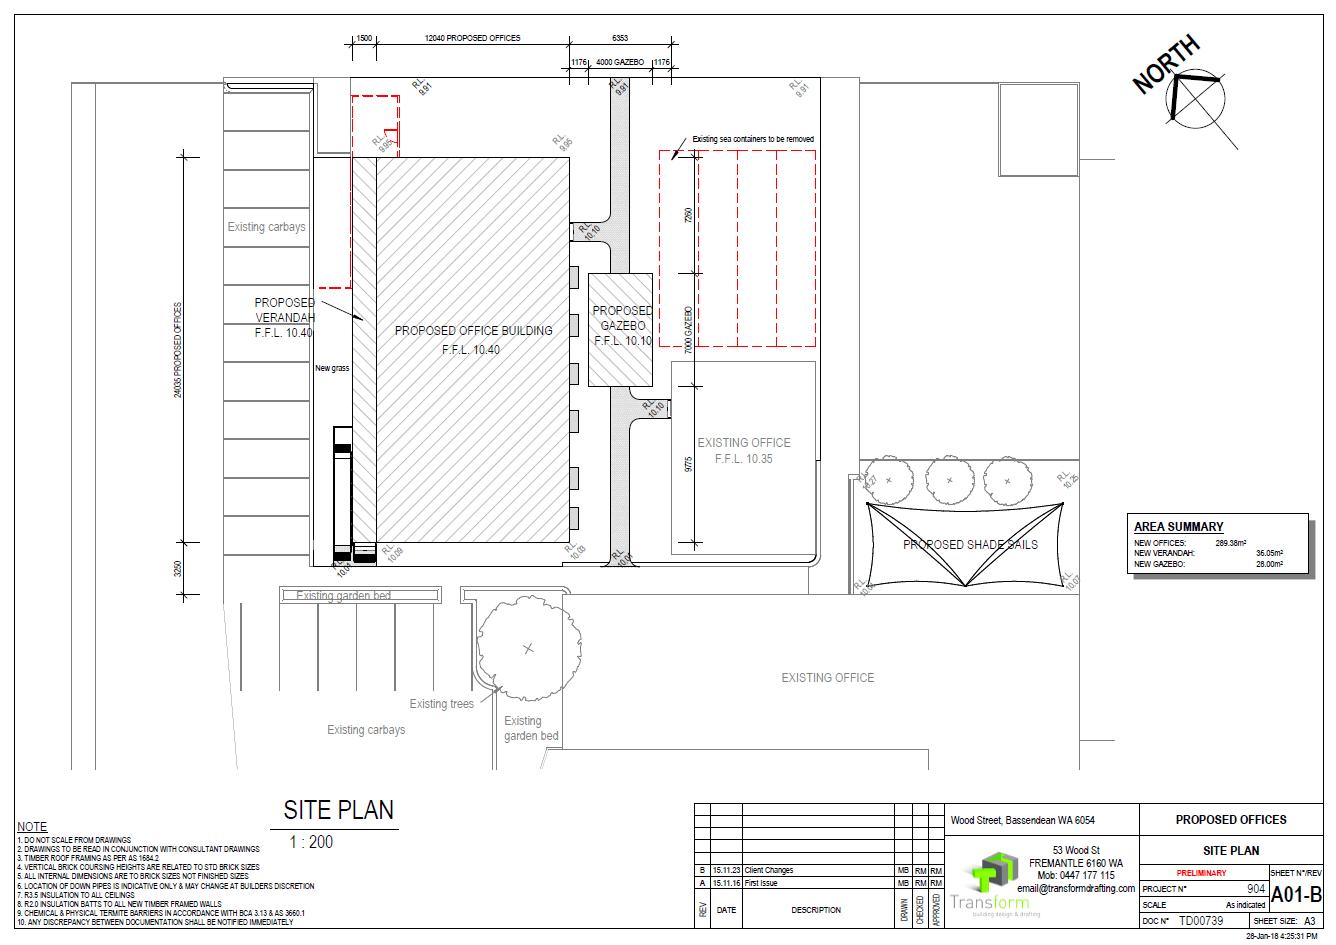 2. Site Plan